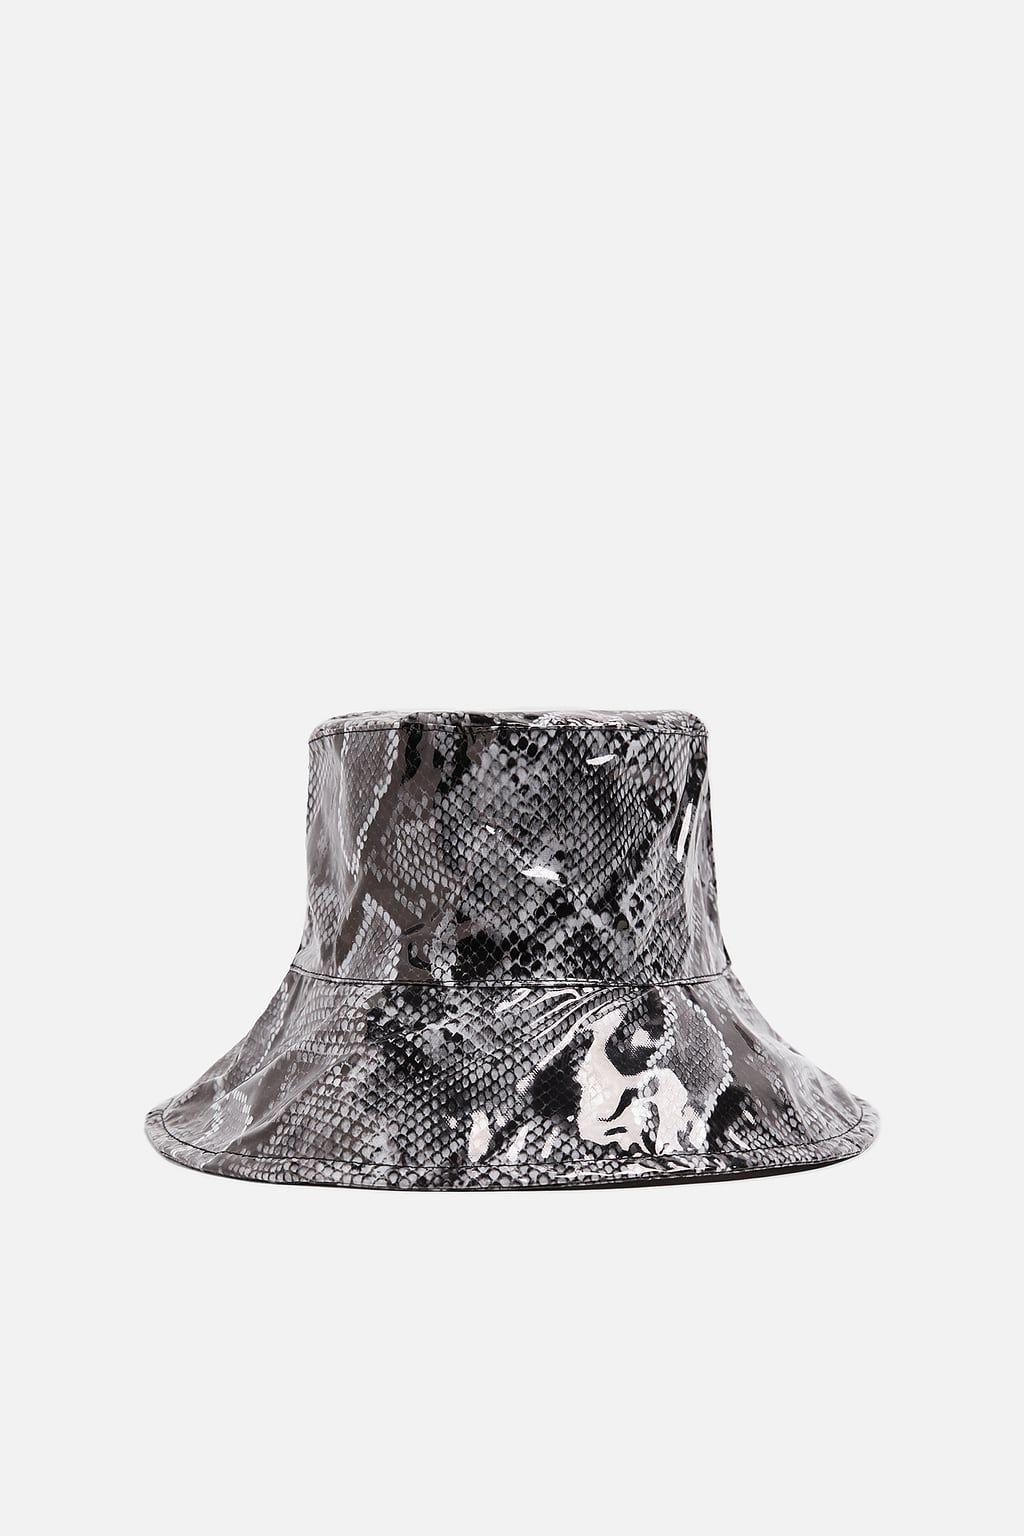 Image 1 Of Leopard Print Rain Hat From Zara Rain Hat Hats Animal Print